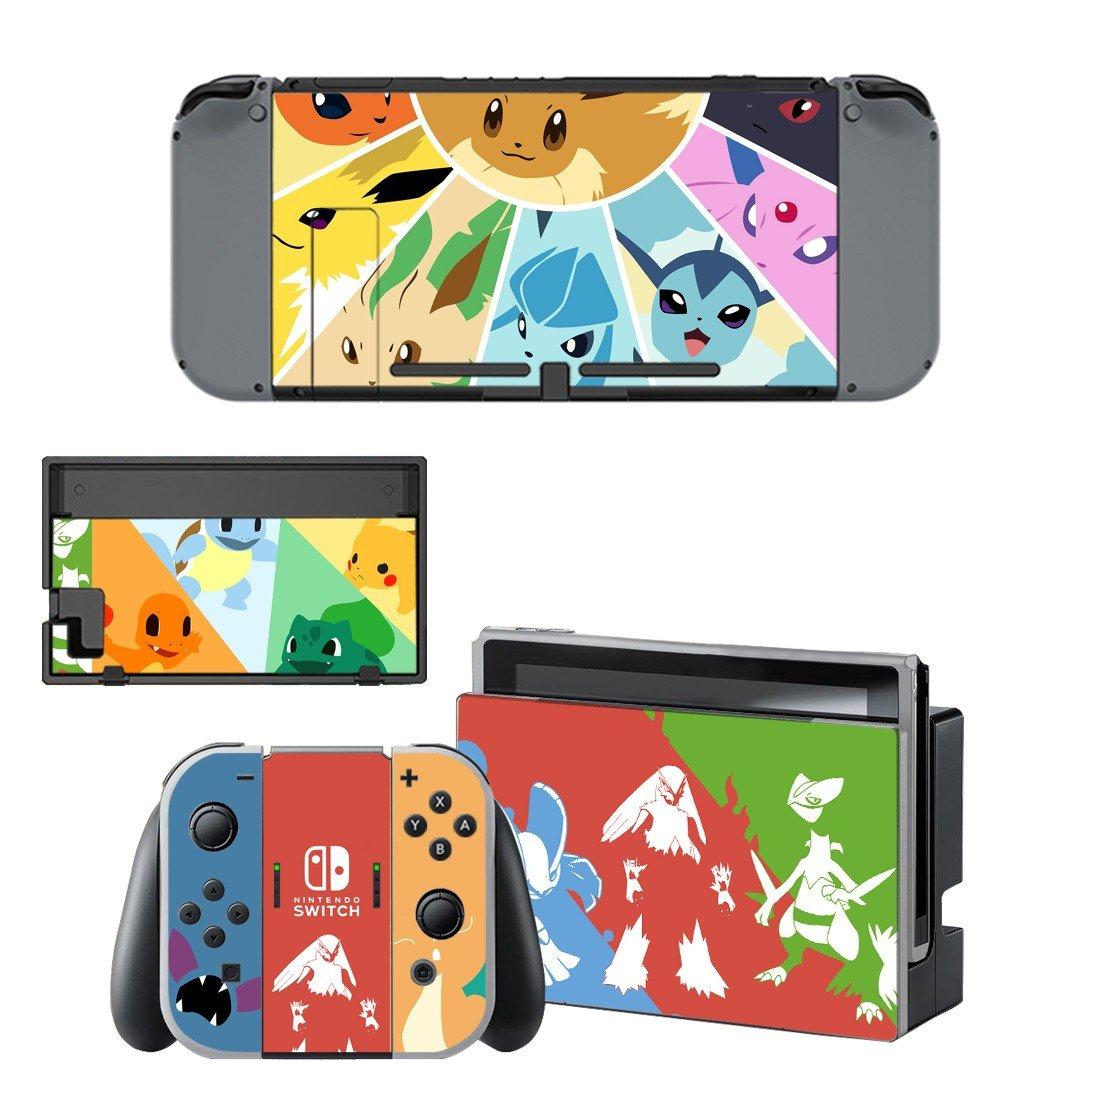 White pokemon decal for Nintendo switch console sticker skin